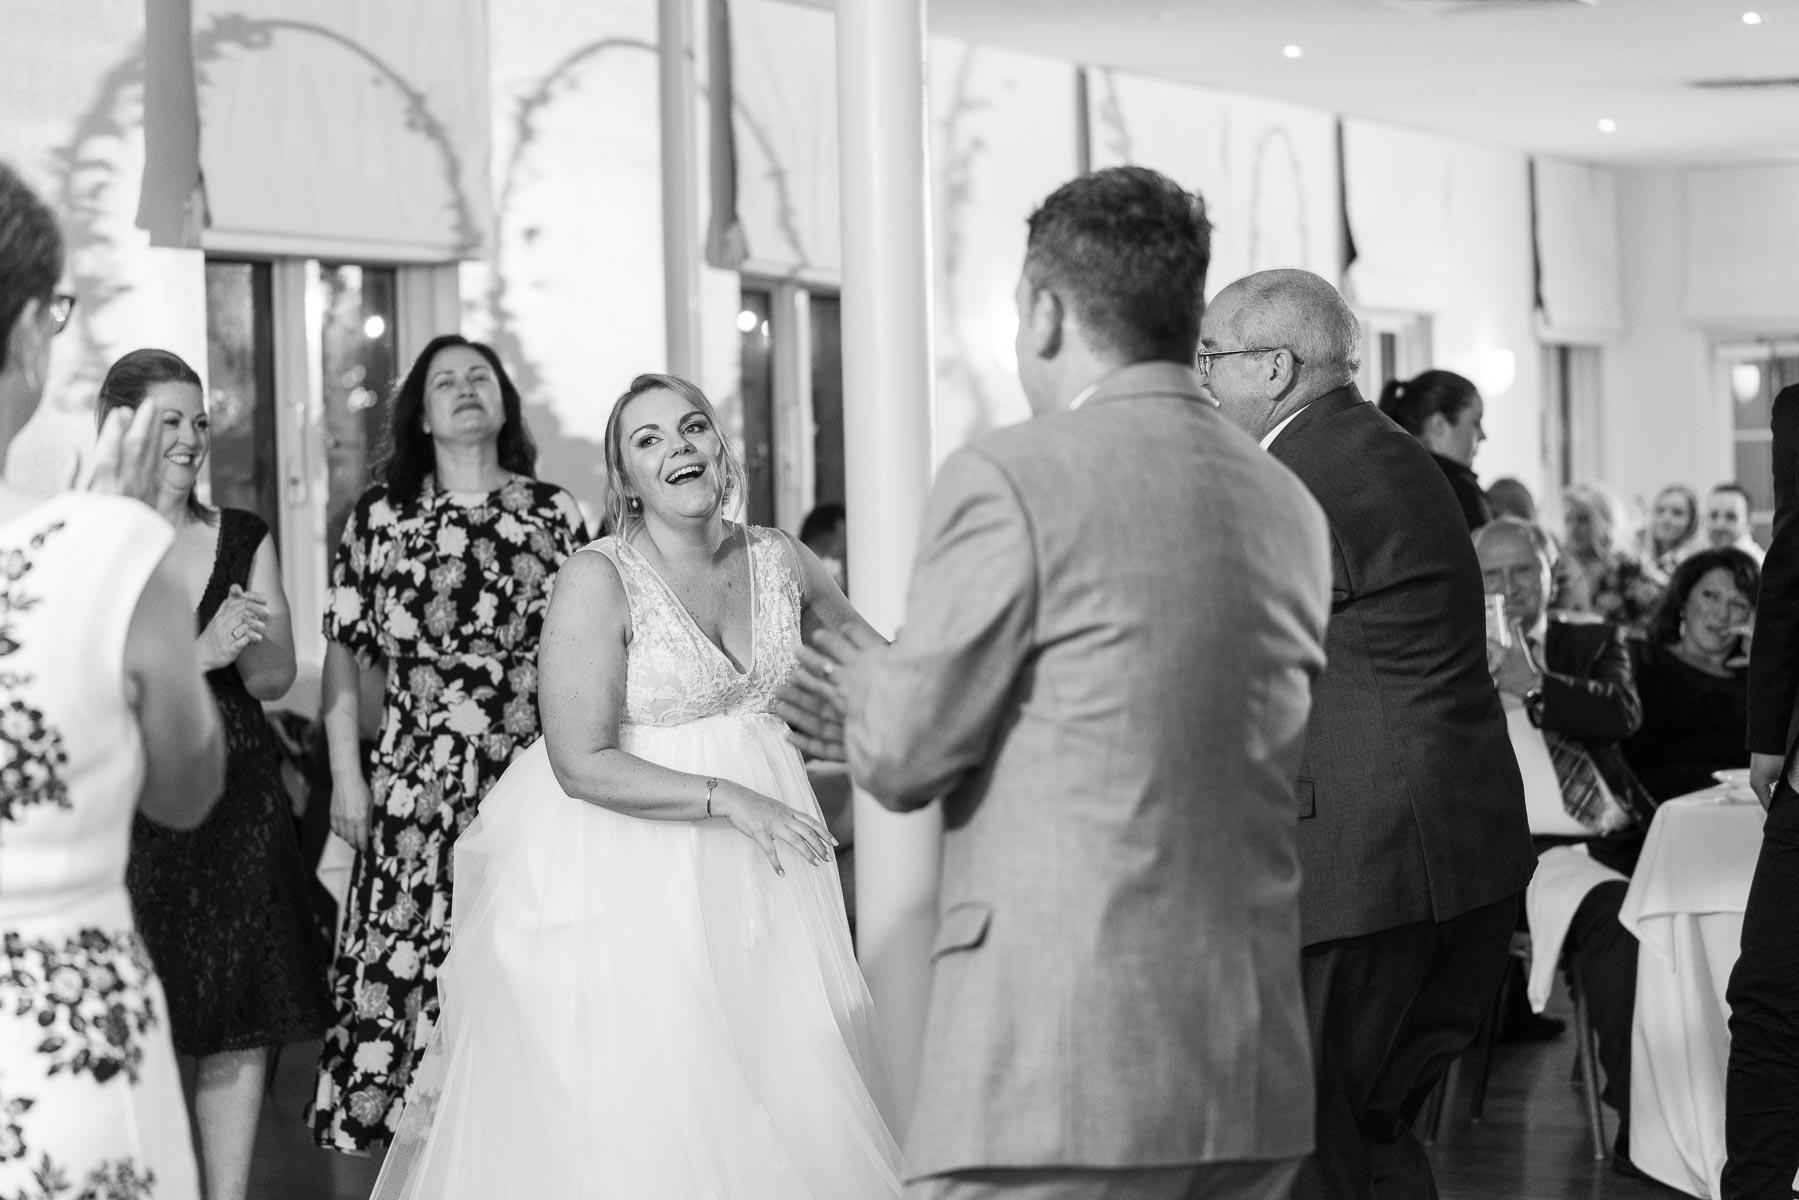 lindenderry-wedding-heart+soul-weddings-amy-alain-03977.jpg